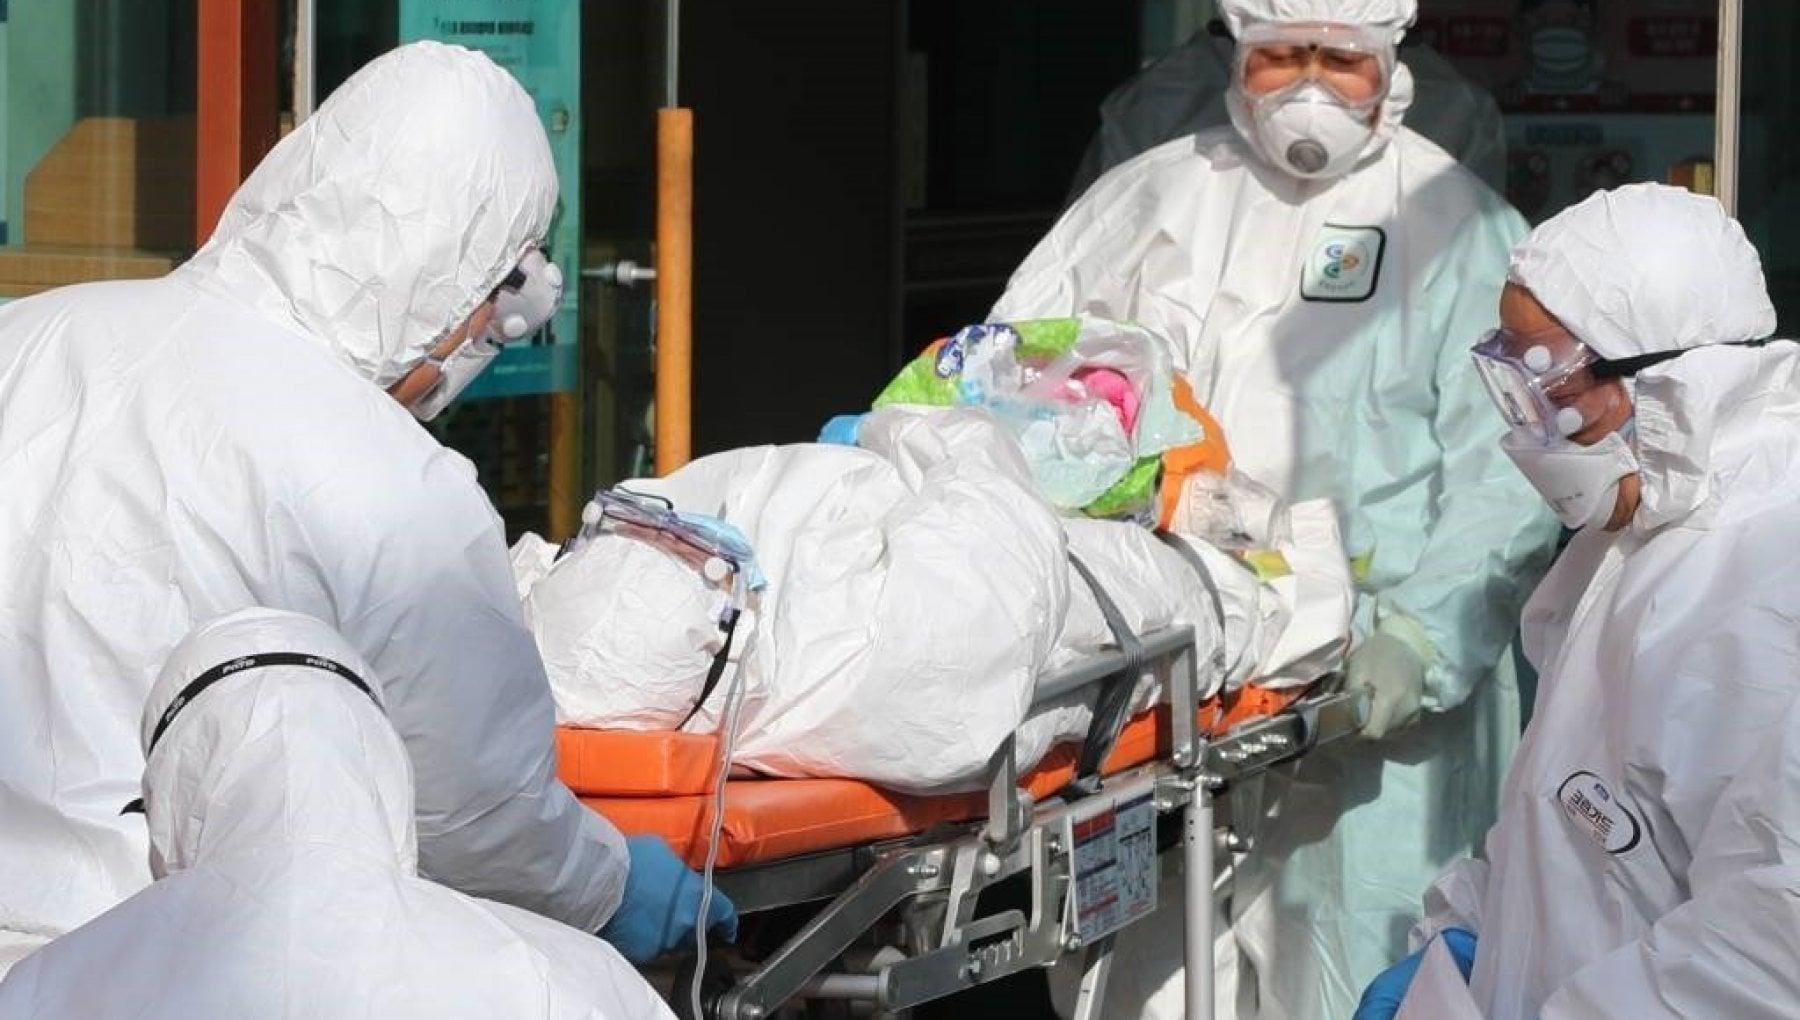 013349815 088c04ec de51 4d41 959a d3e4601945c2 - Ebola: primo caso in Costa d'Avorio, una 18enne in arrivo dalla Guinea